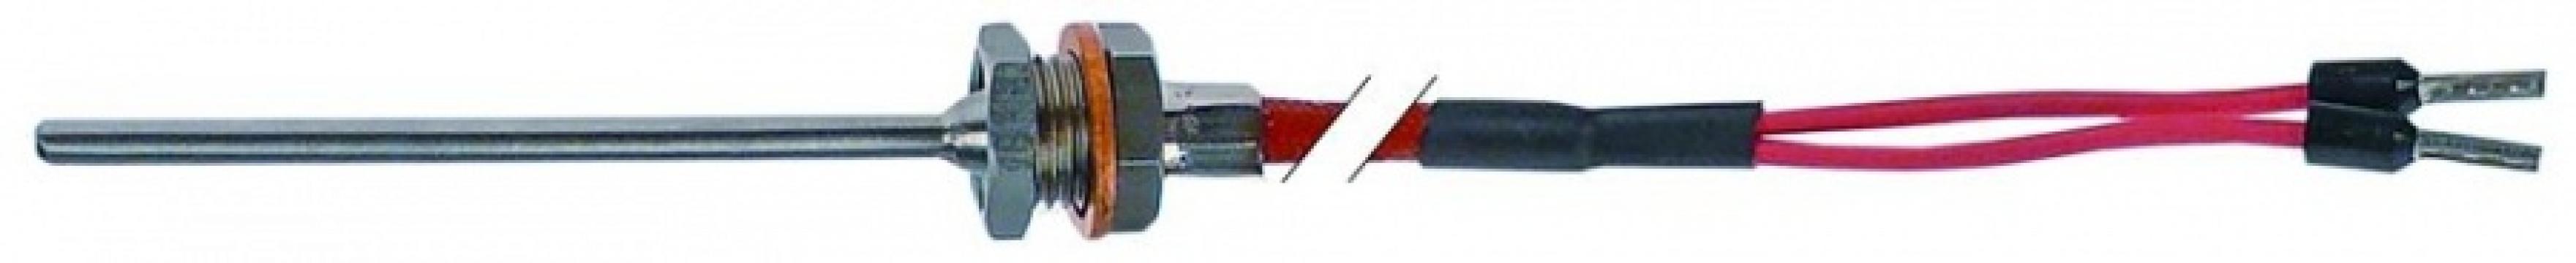 Sonda temperatura Pt1000, cablu PTFE 379331